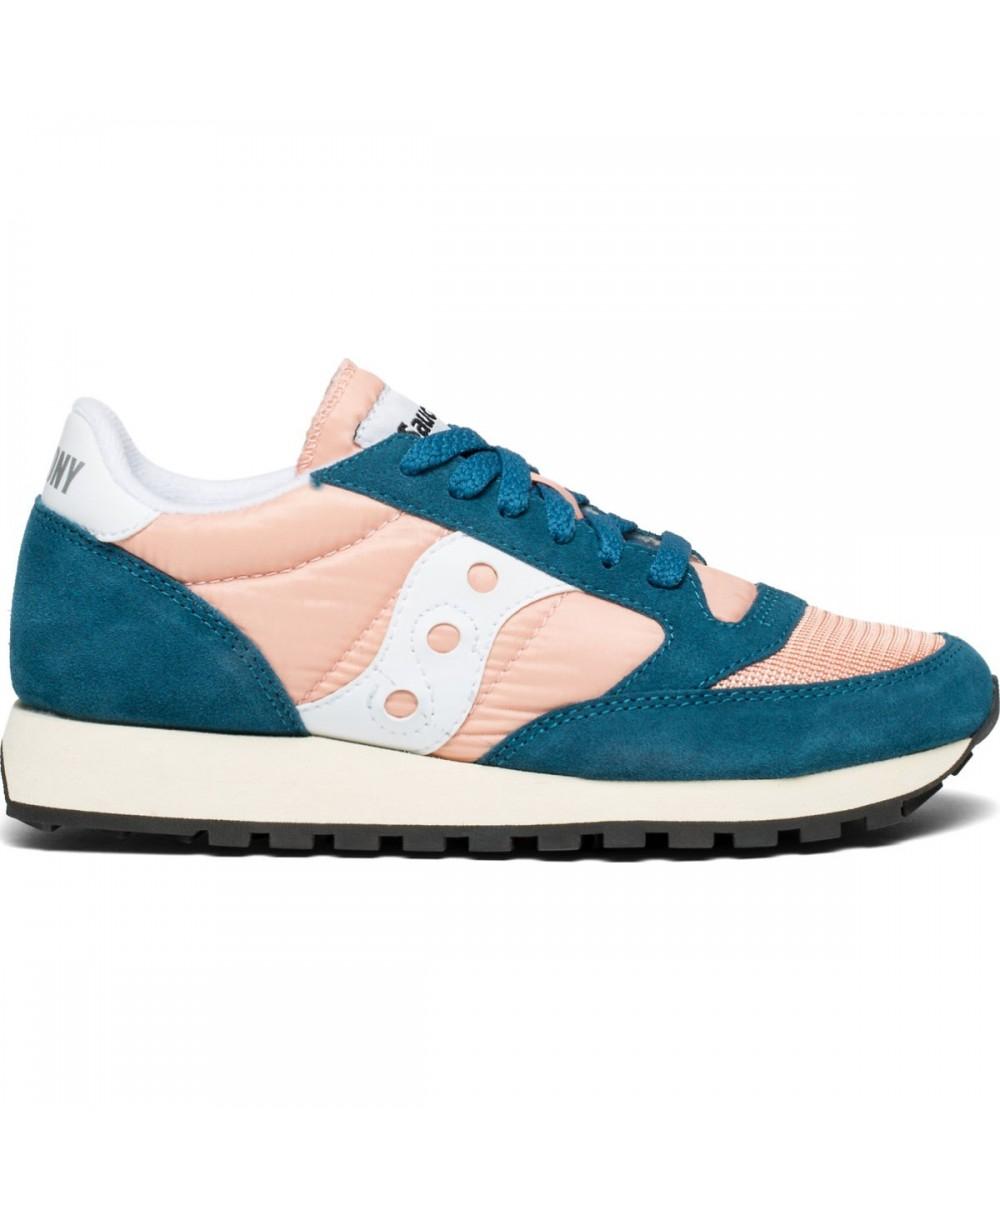 Buy Saucony Footwear Online | SV Sports